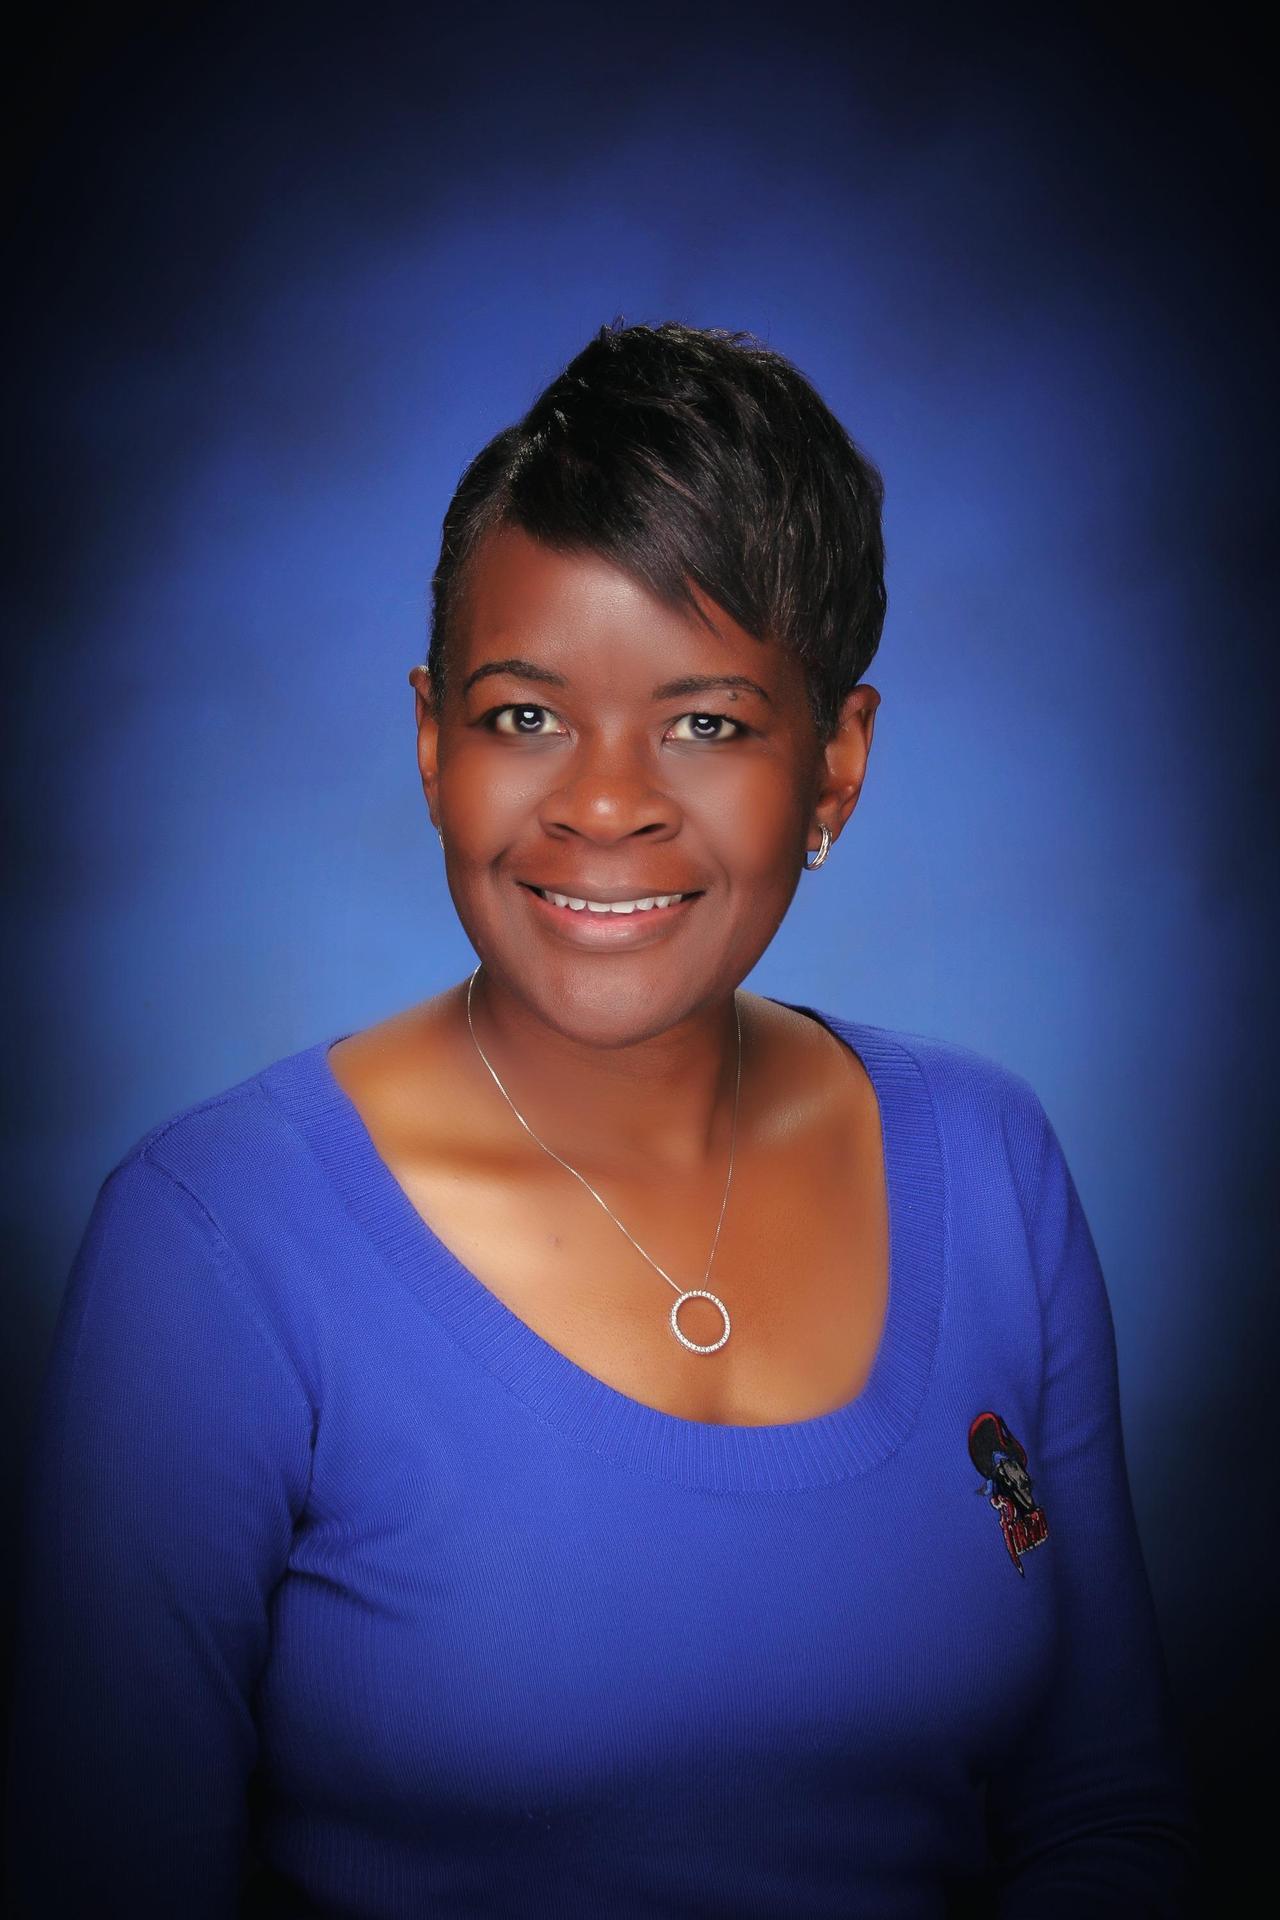 Dr. Carla J. Evers